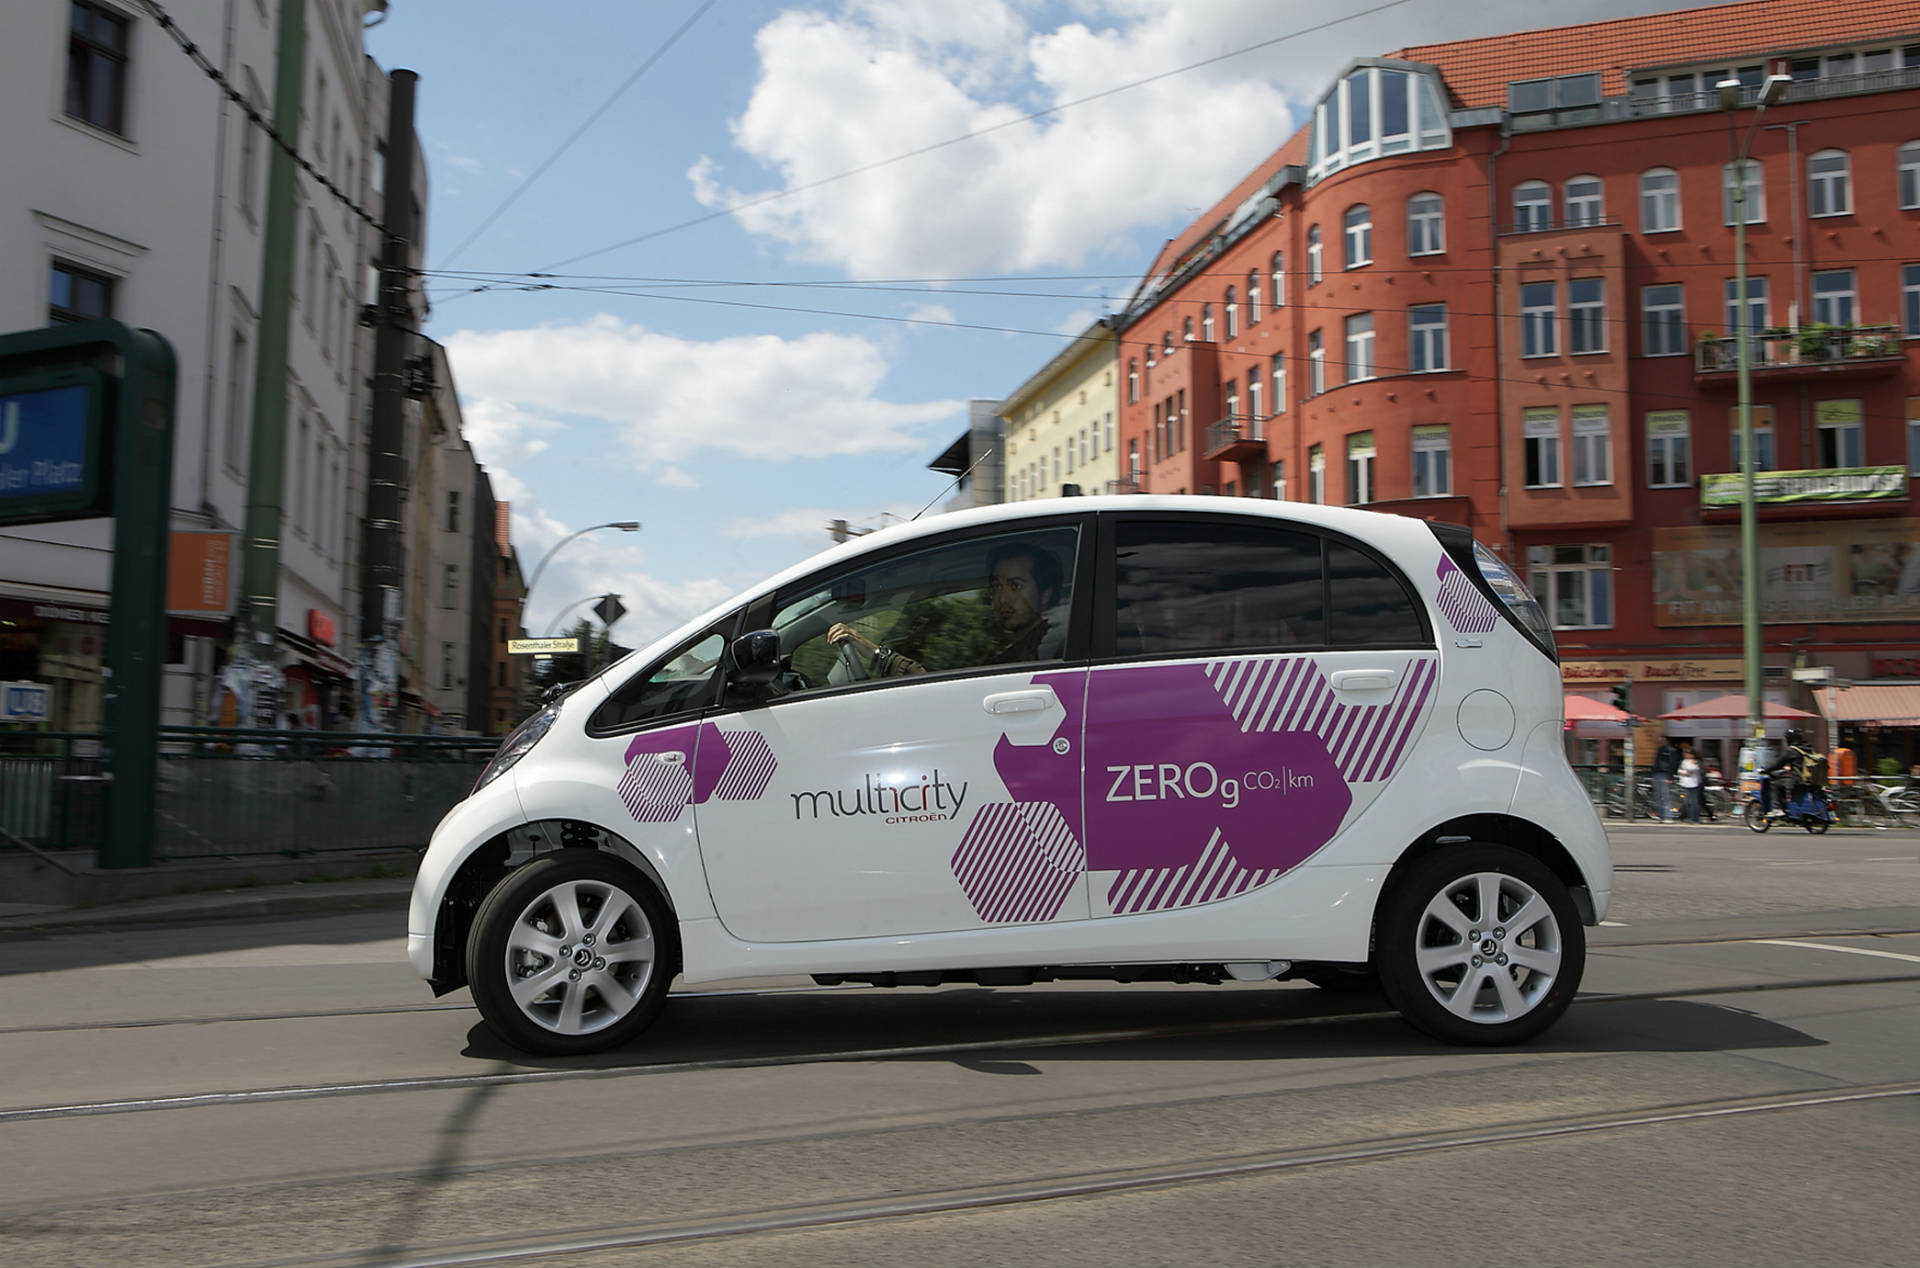 C-Zero von Multicity Carsharing